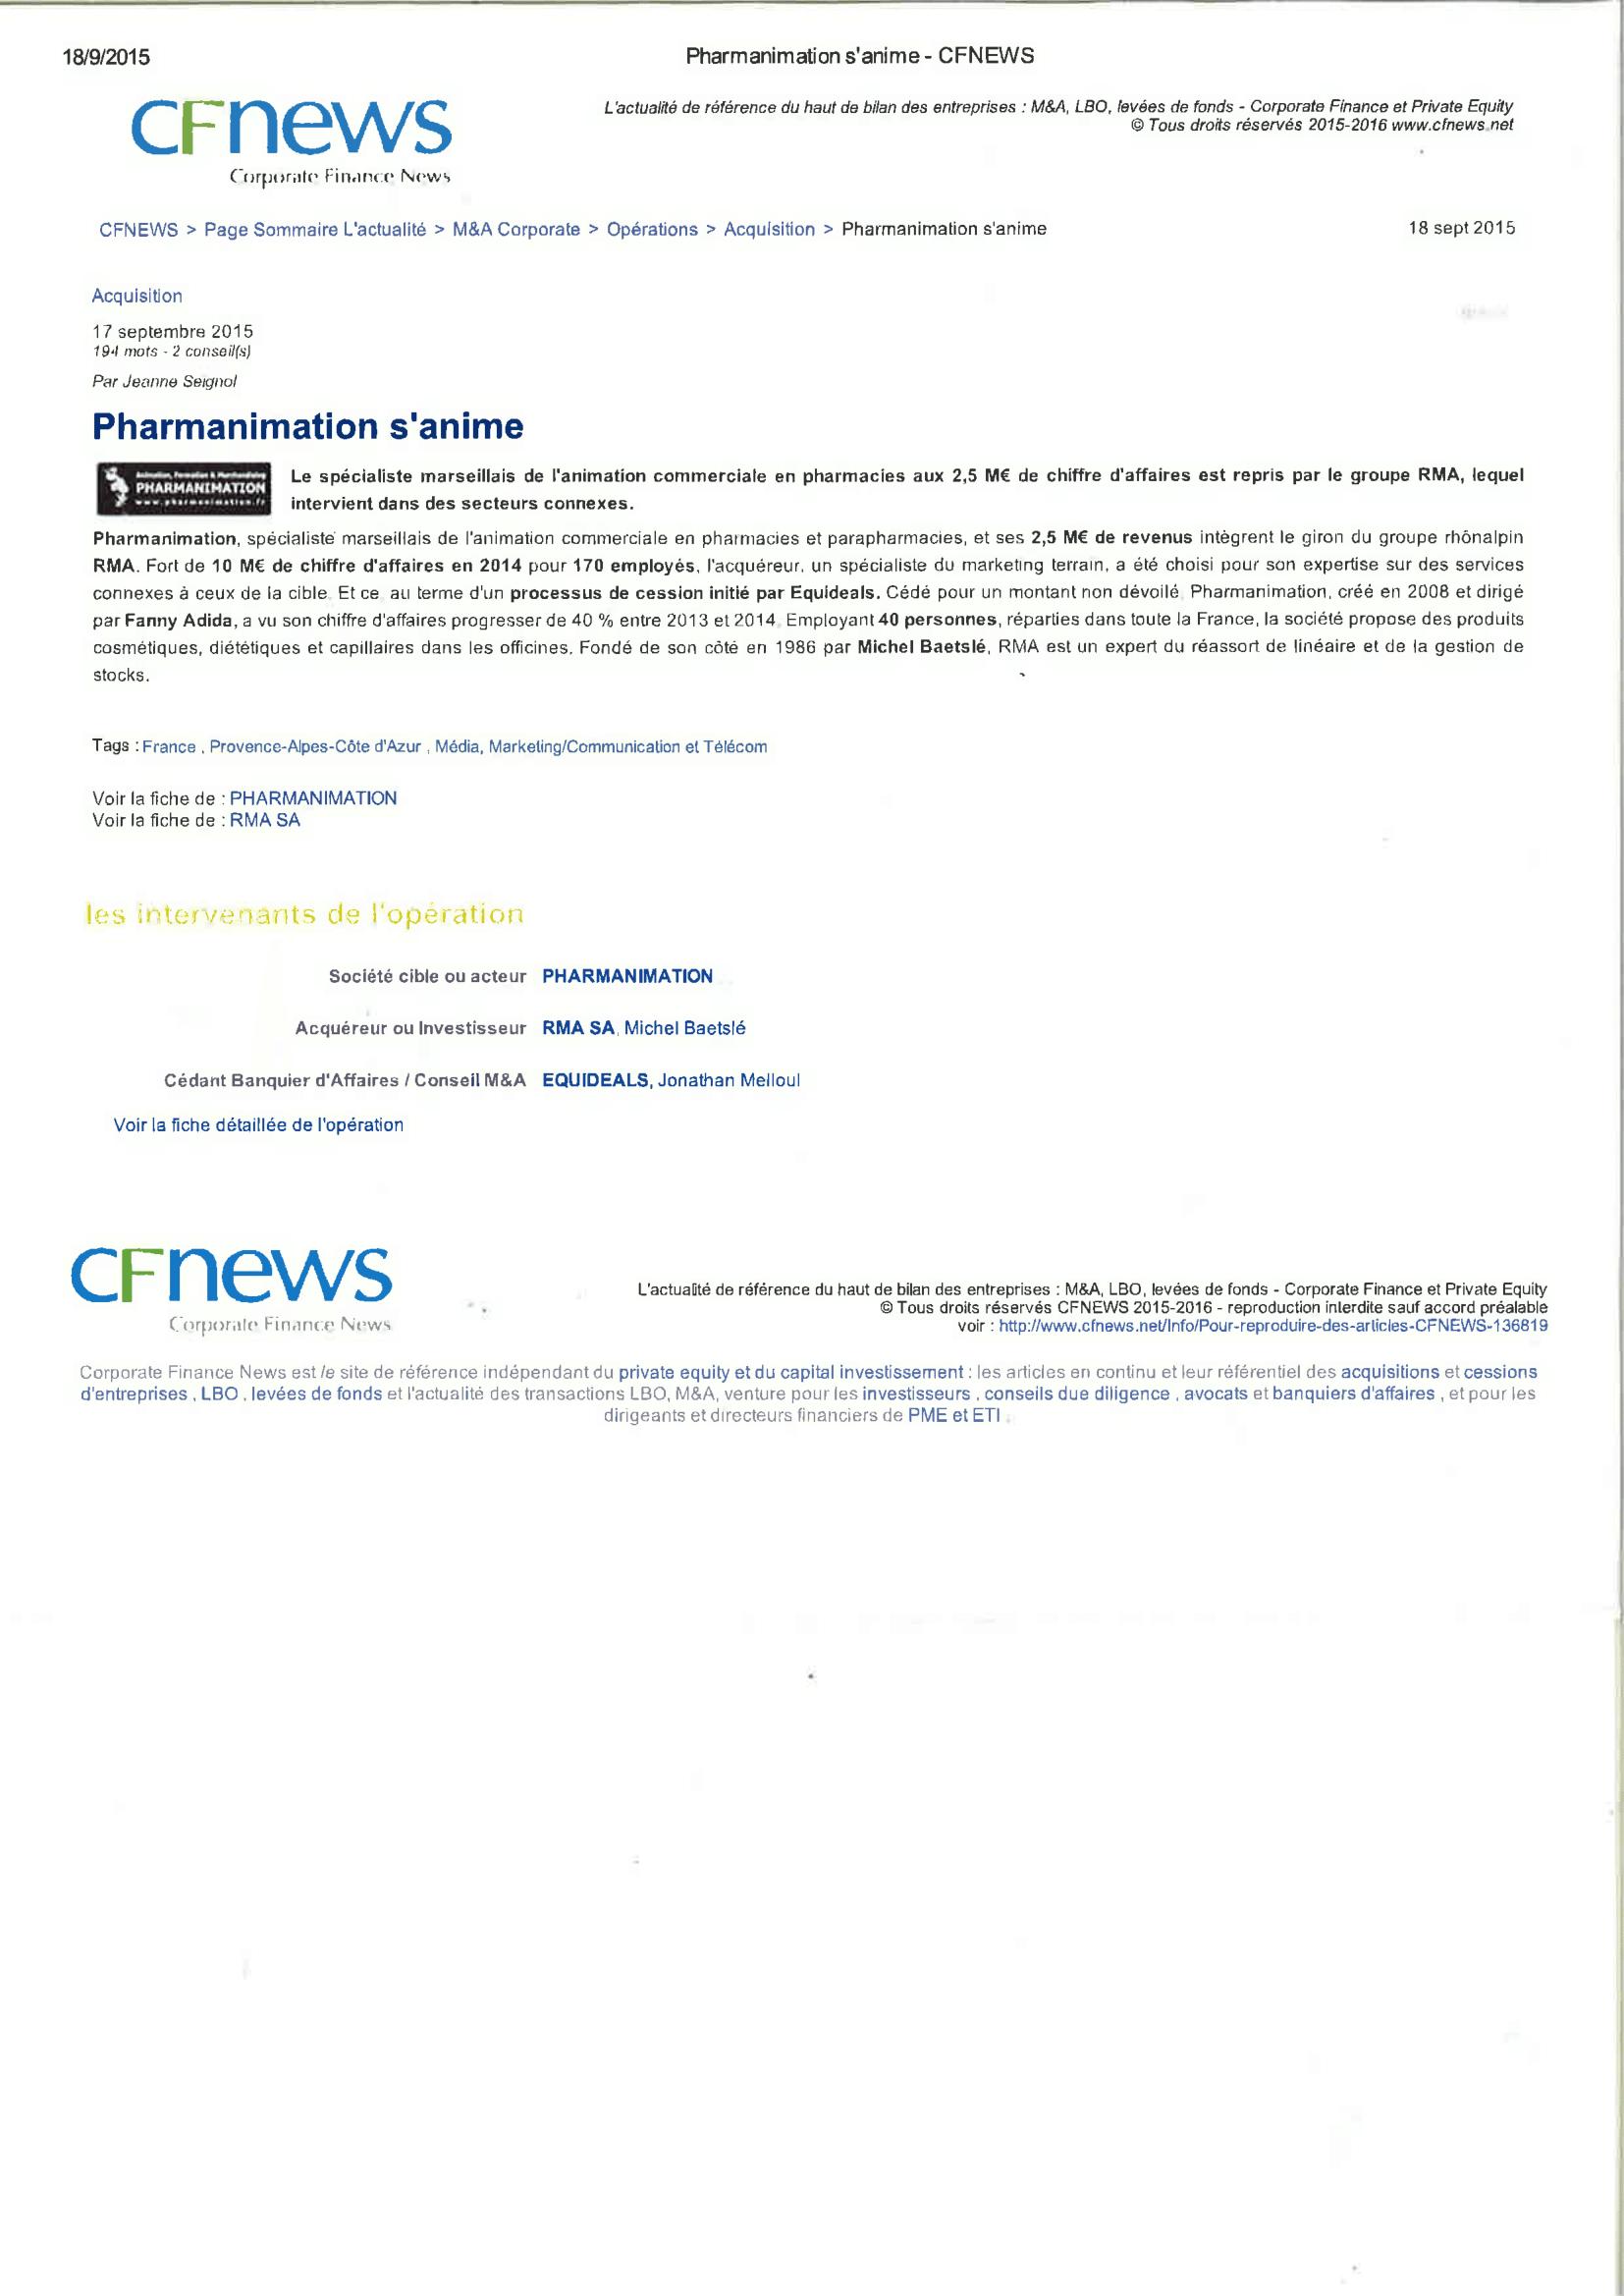 CFNews Pharmanimation-1.png